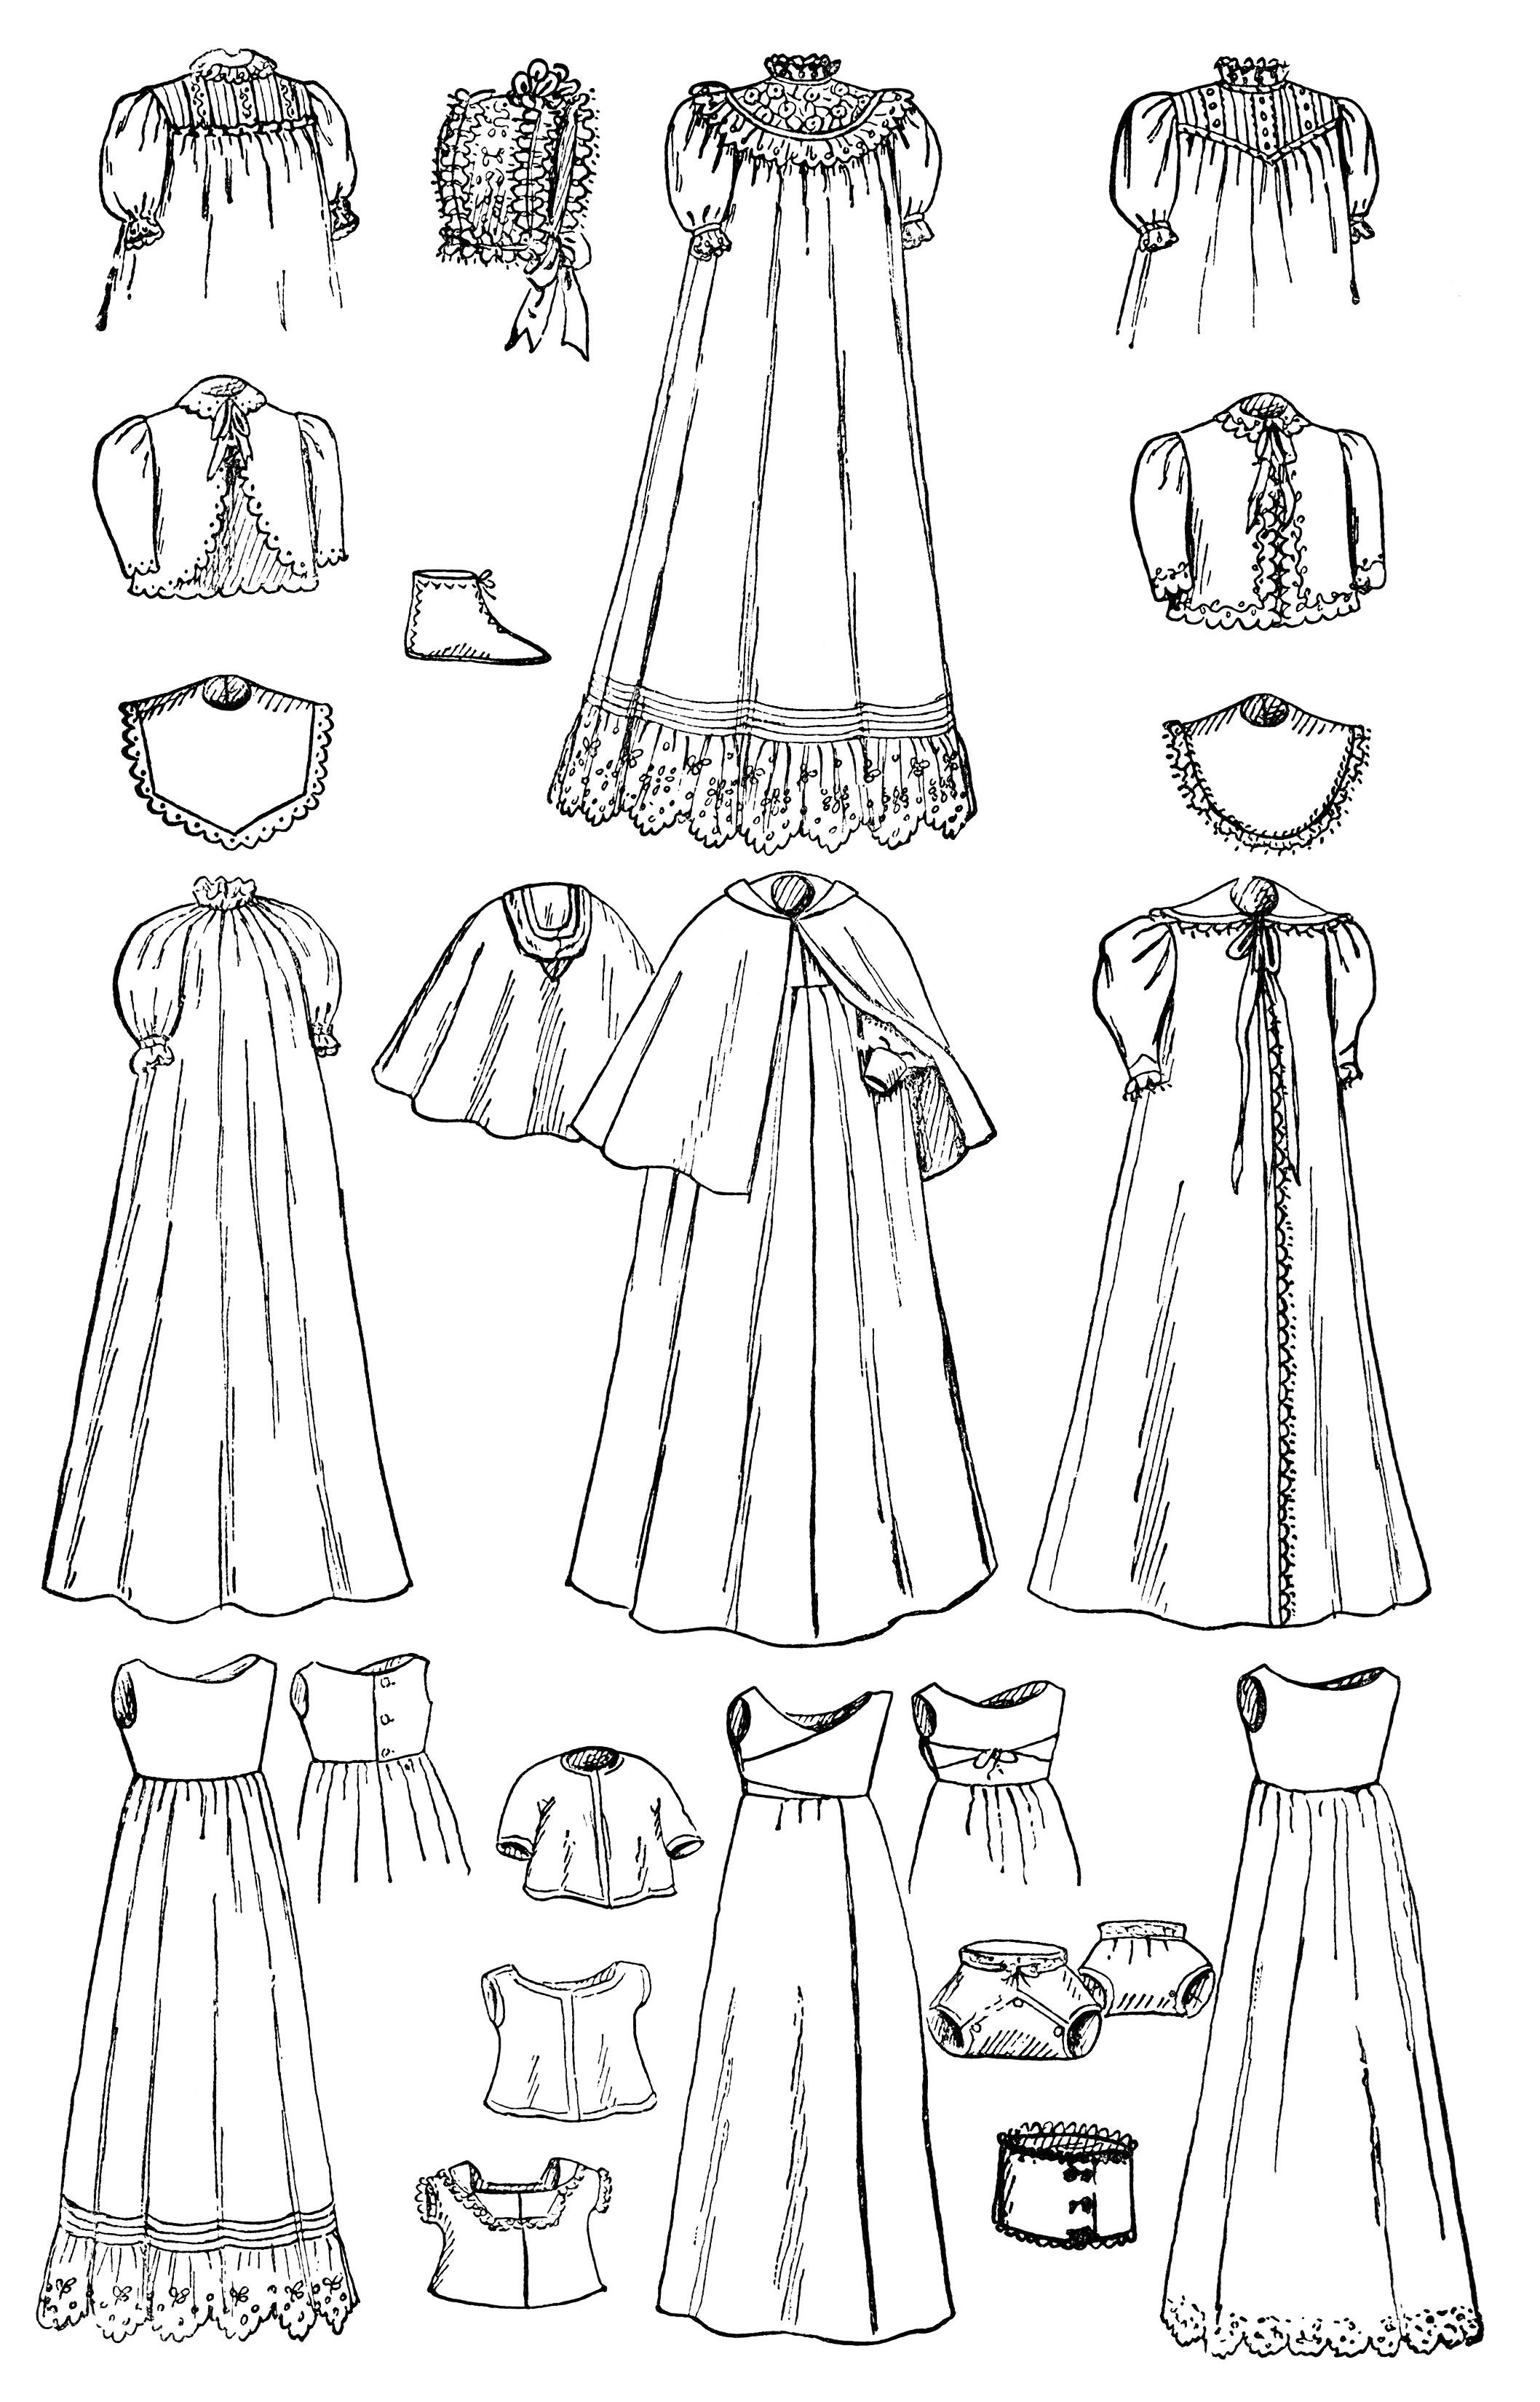 Infant S Wardrobe Free Vintage Clip Art